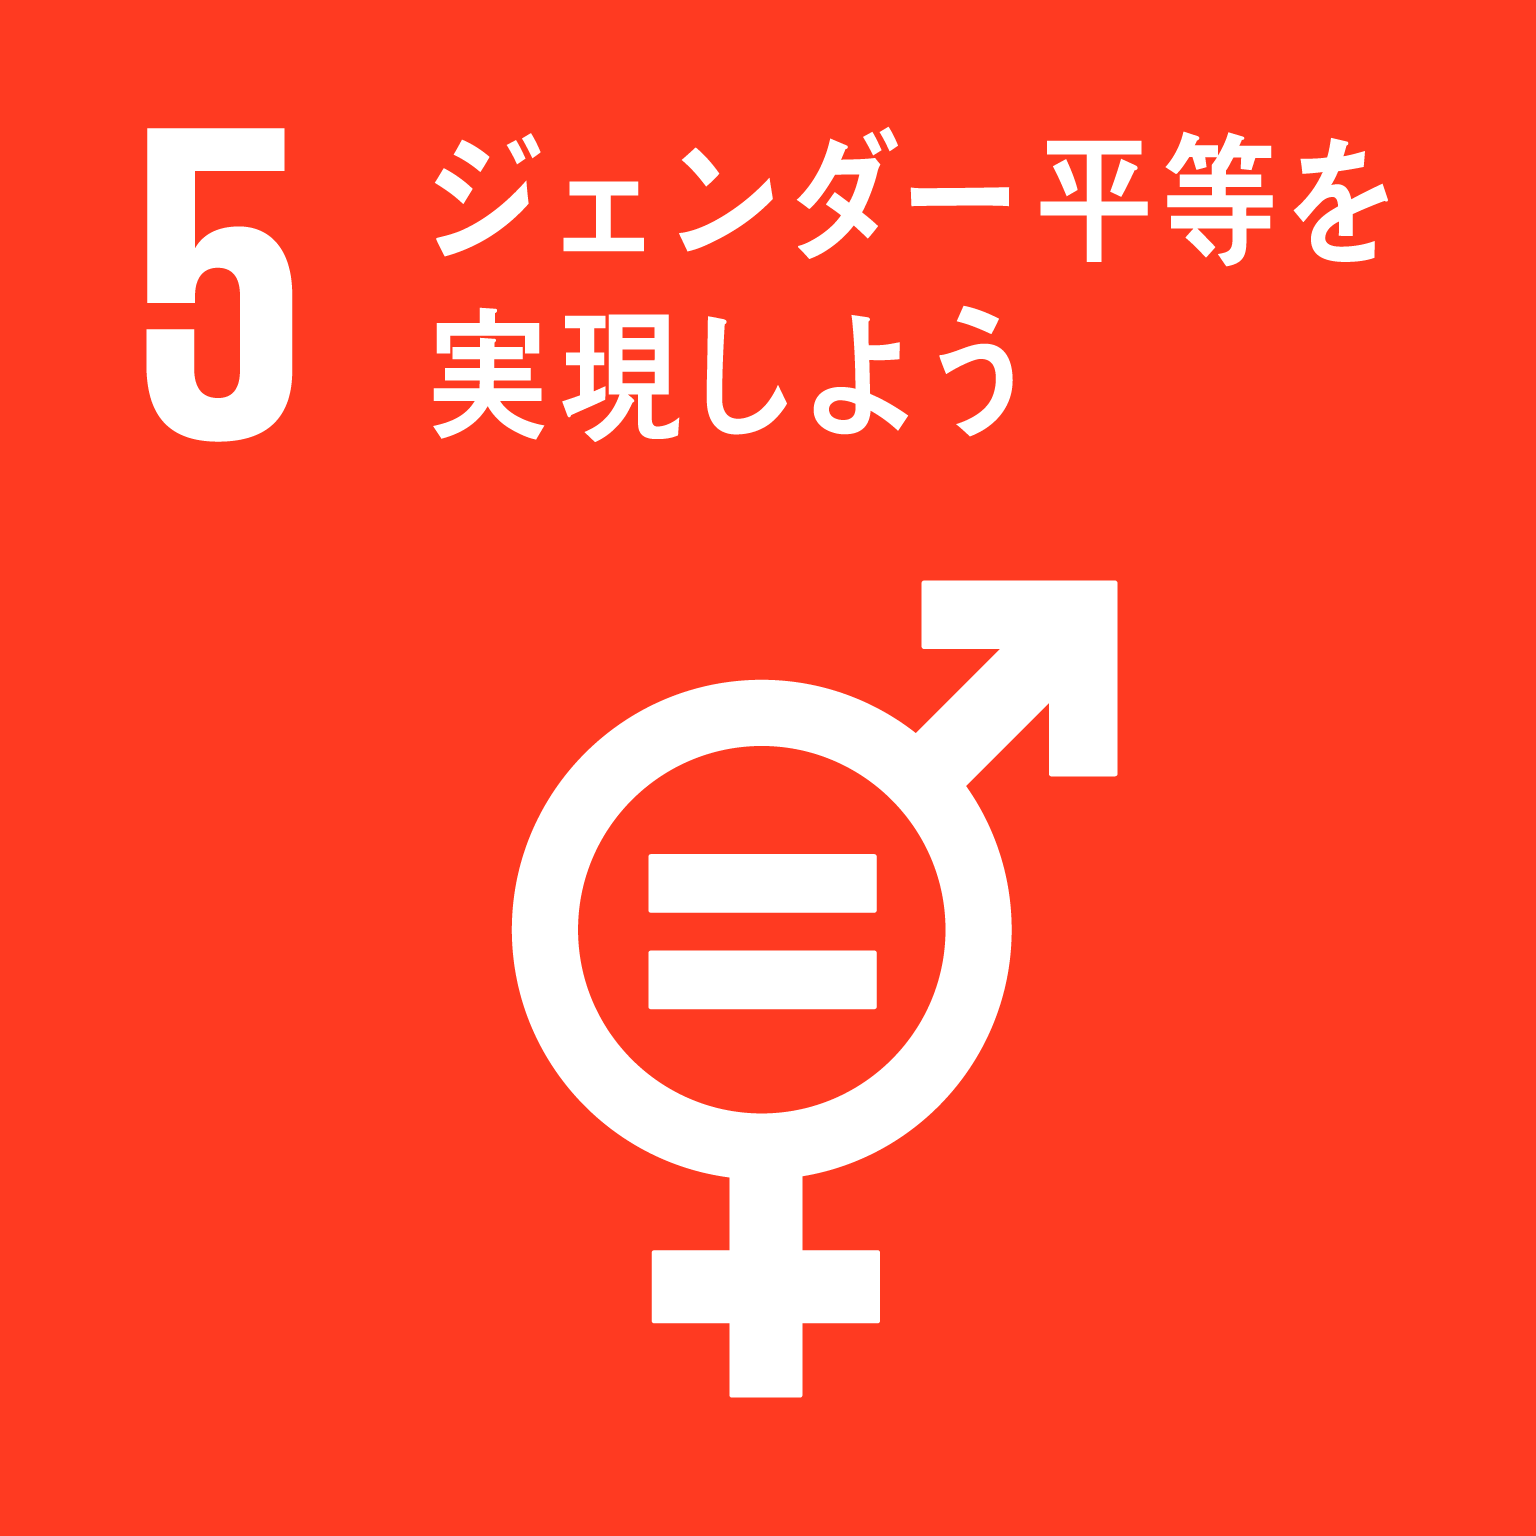 https://www.unic.or.jp/files/sdg_icon_05_ja.png